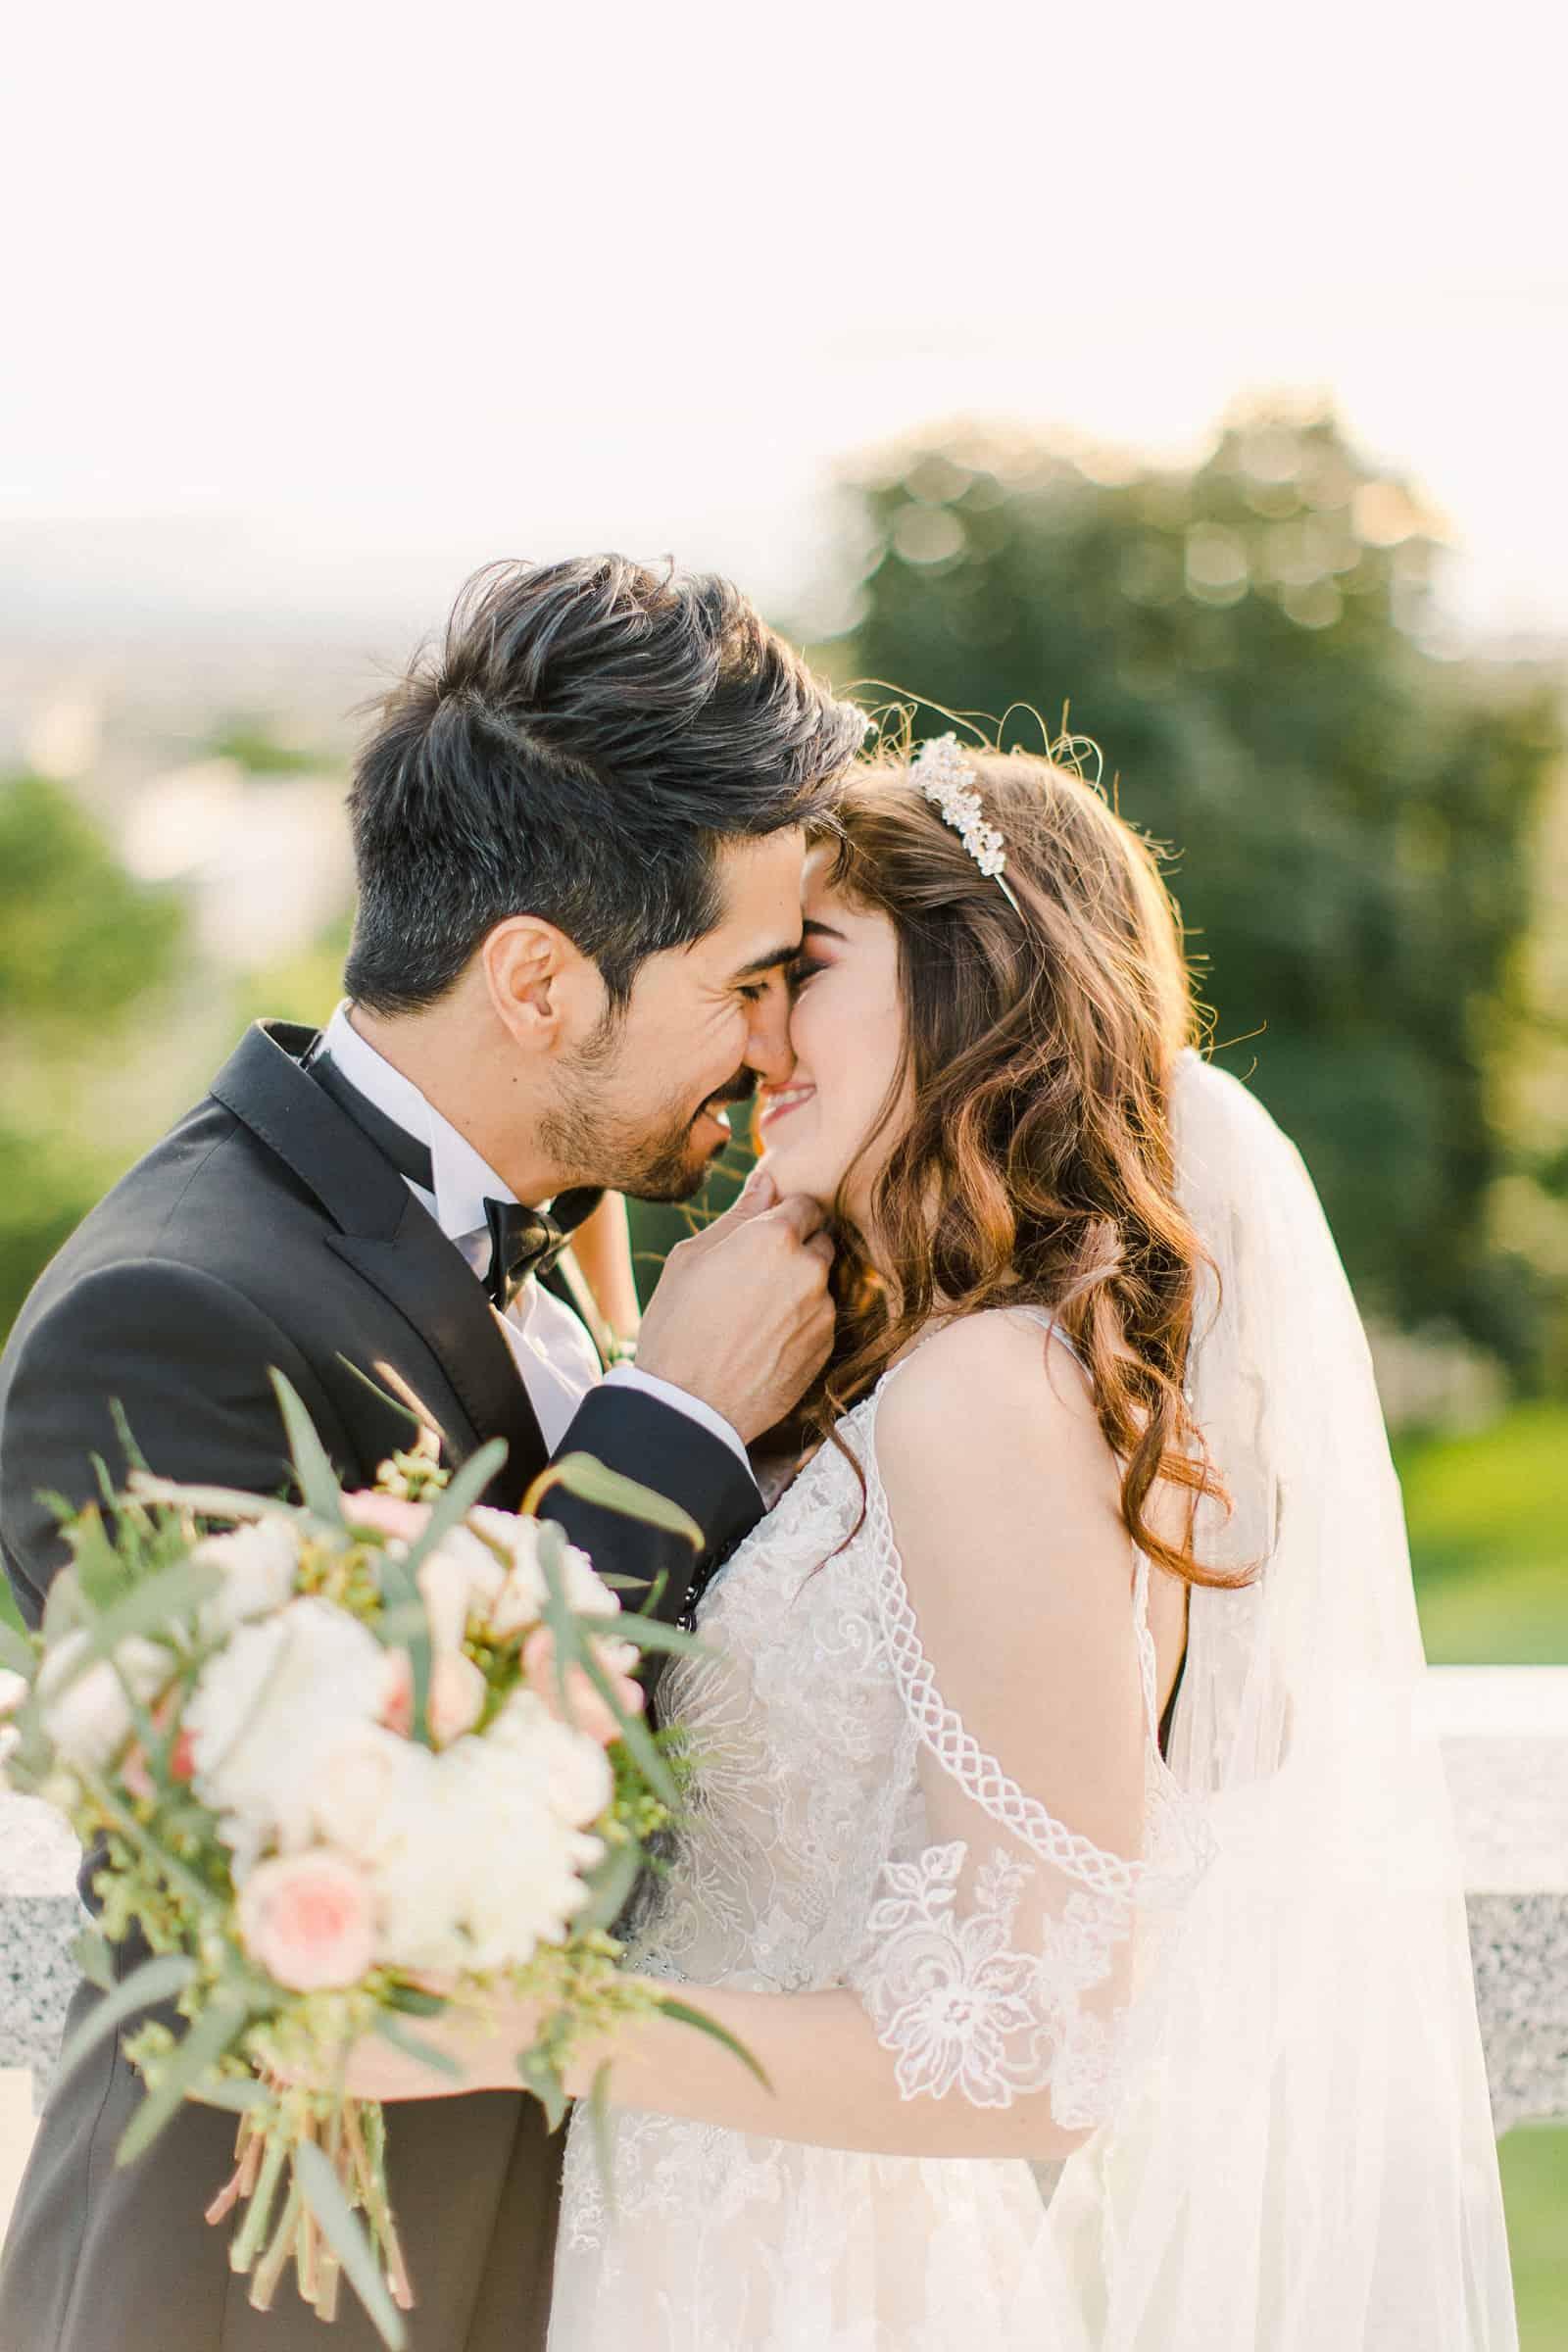 Palestinian Iranian Bride and Groom, Utah Wedding Photography at the Utah State Capitol